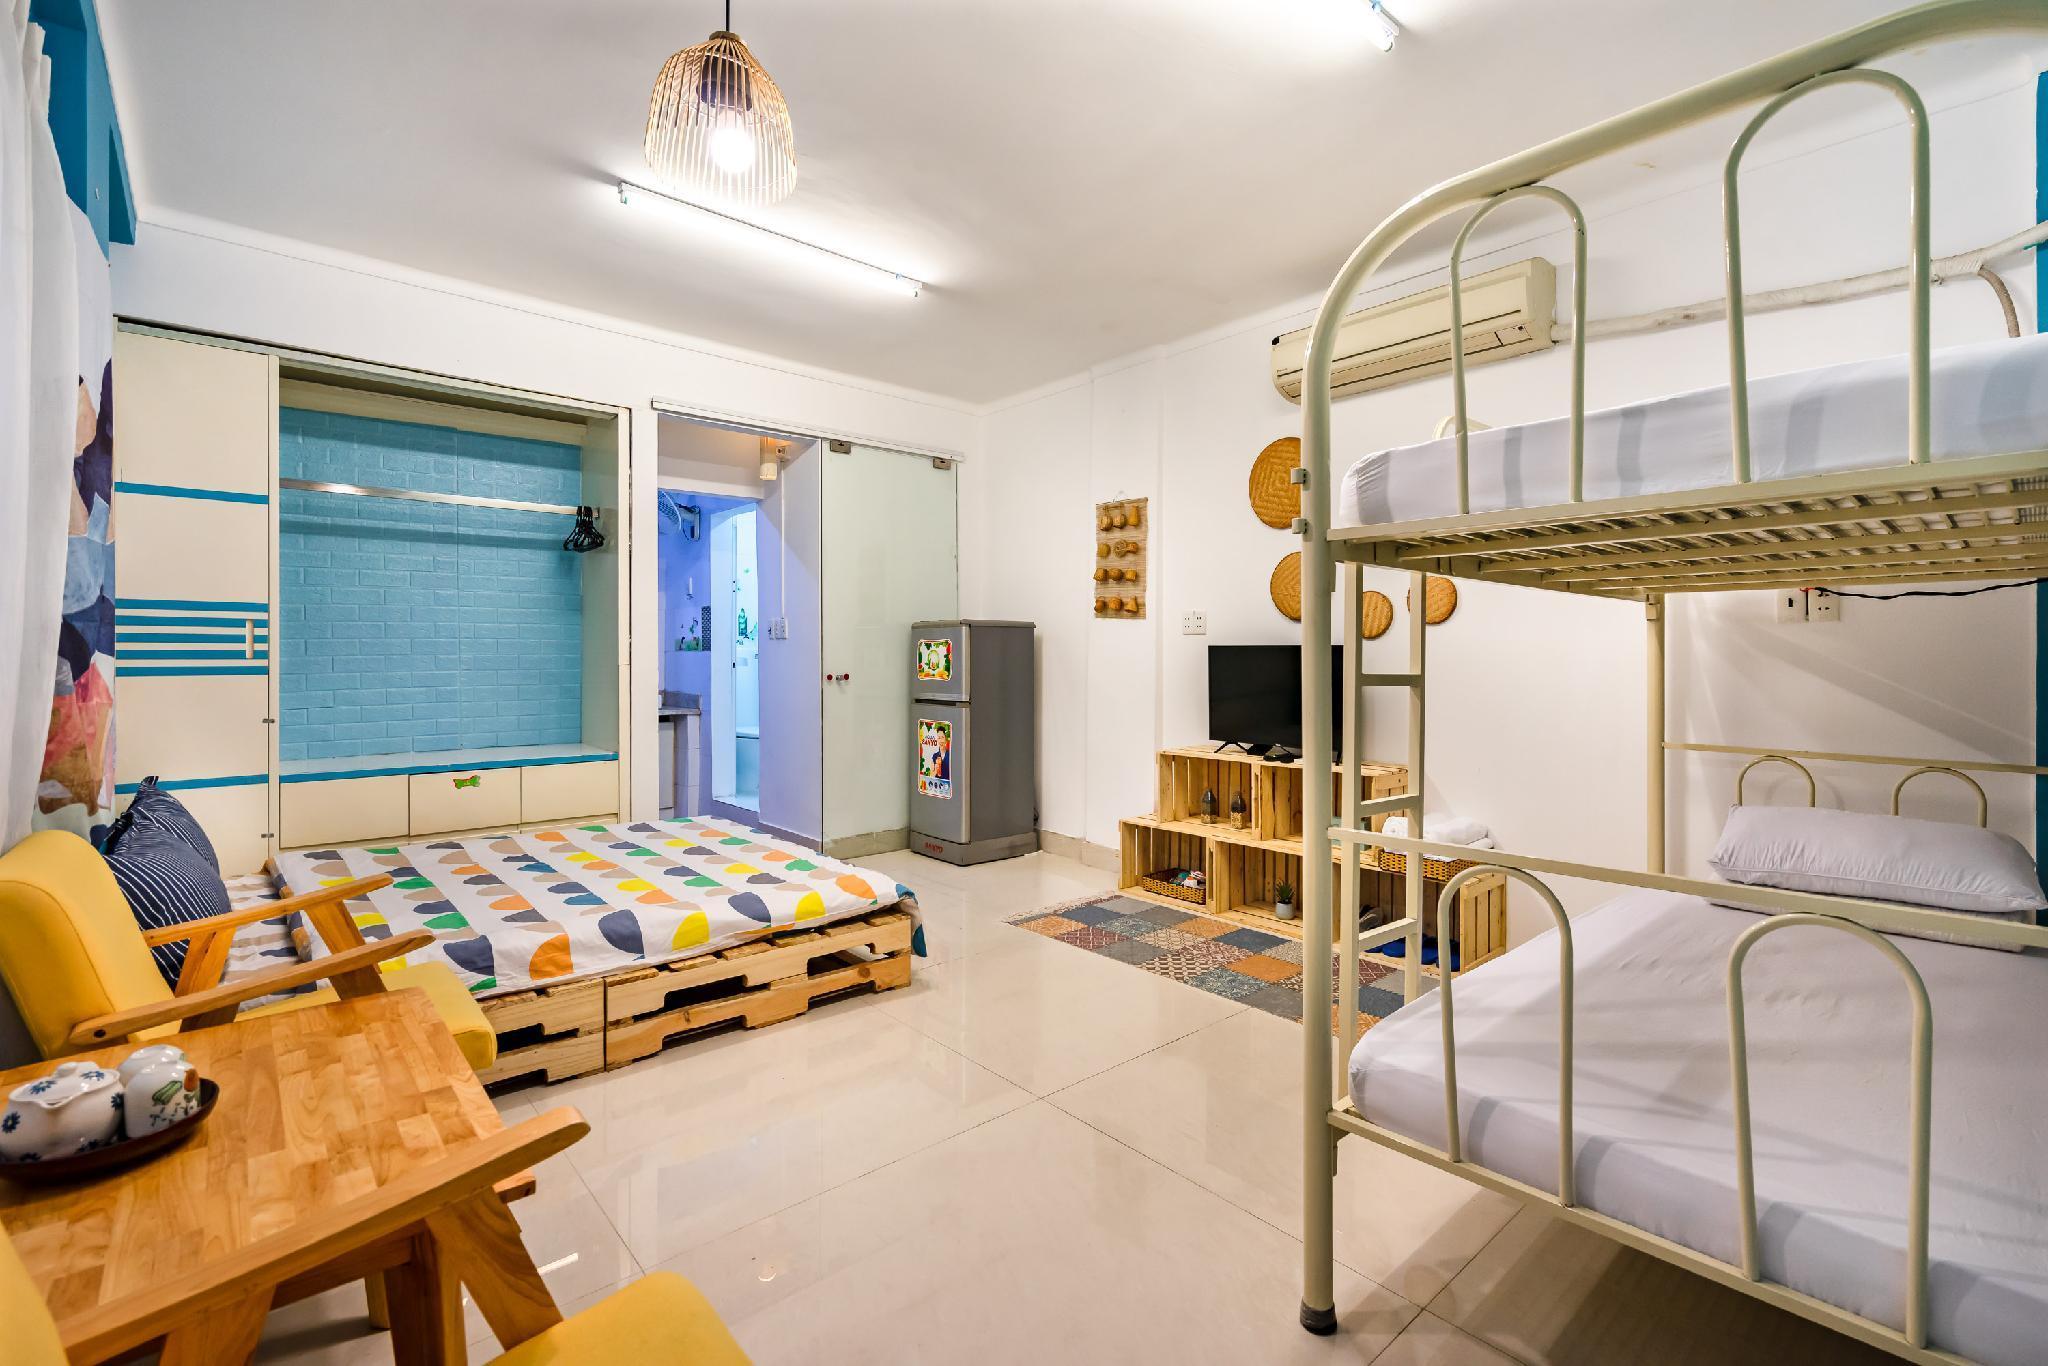 Apartment Max12people CentralDist1 BenThanh Market